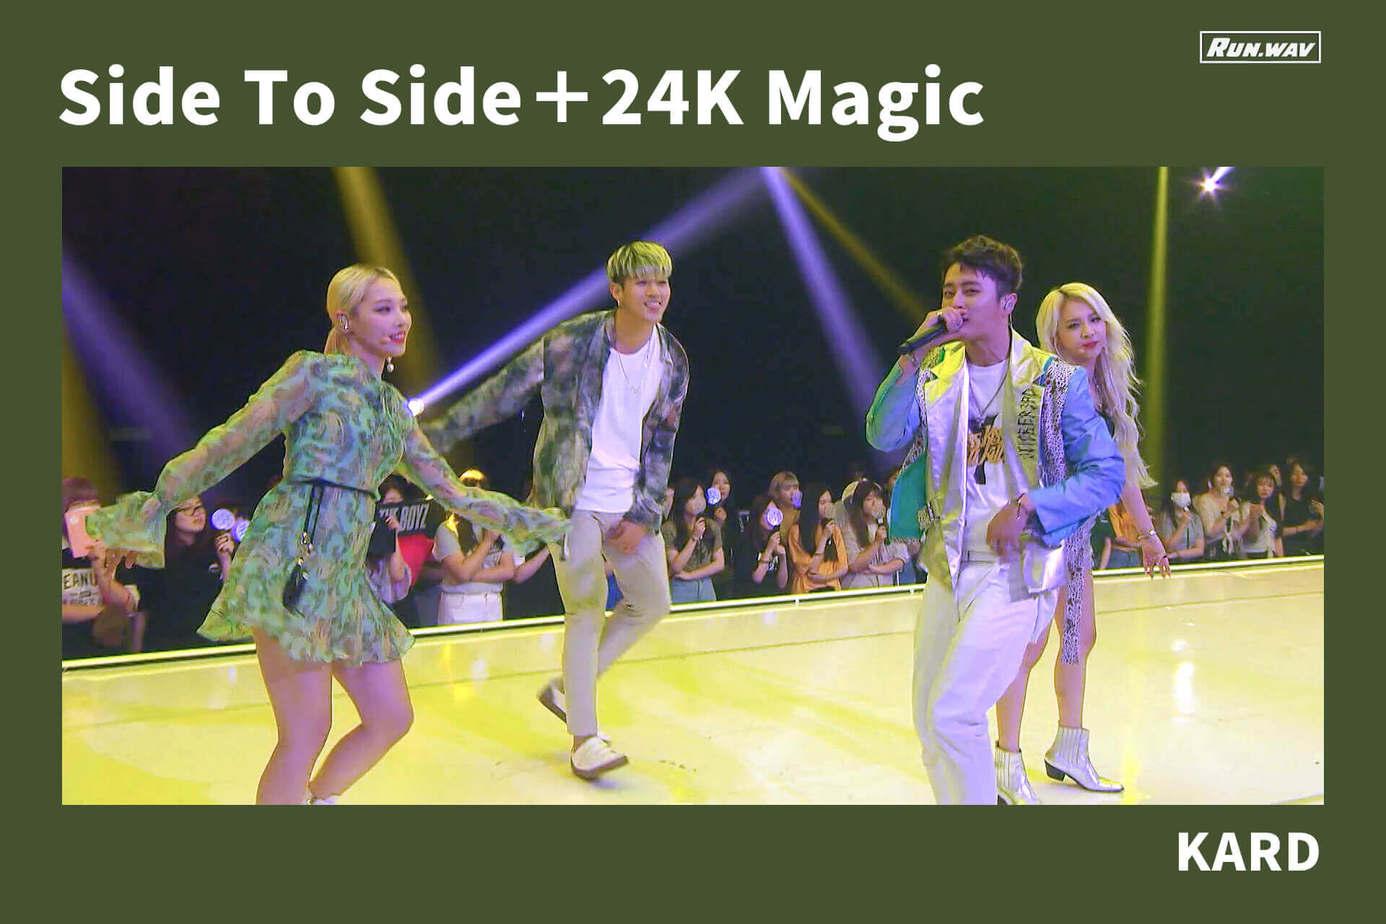 Side To Side+24K Magic KARD